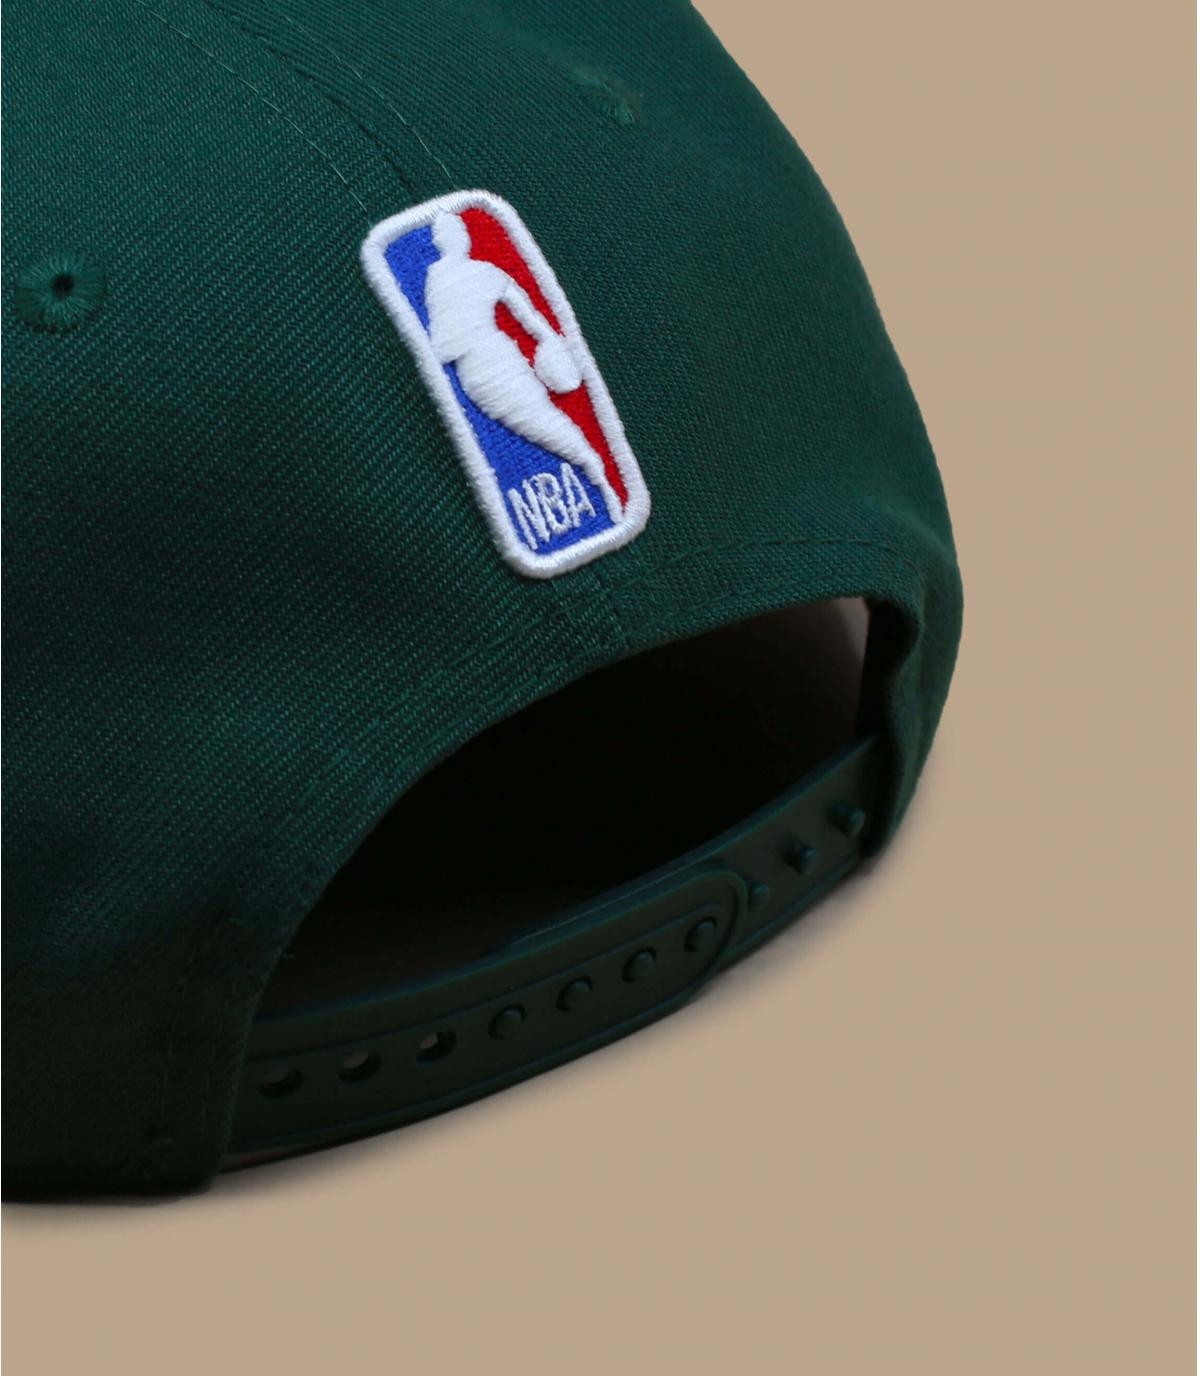 Détails Snapback NBA Draft Bucks 950 - image 4